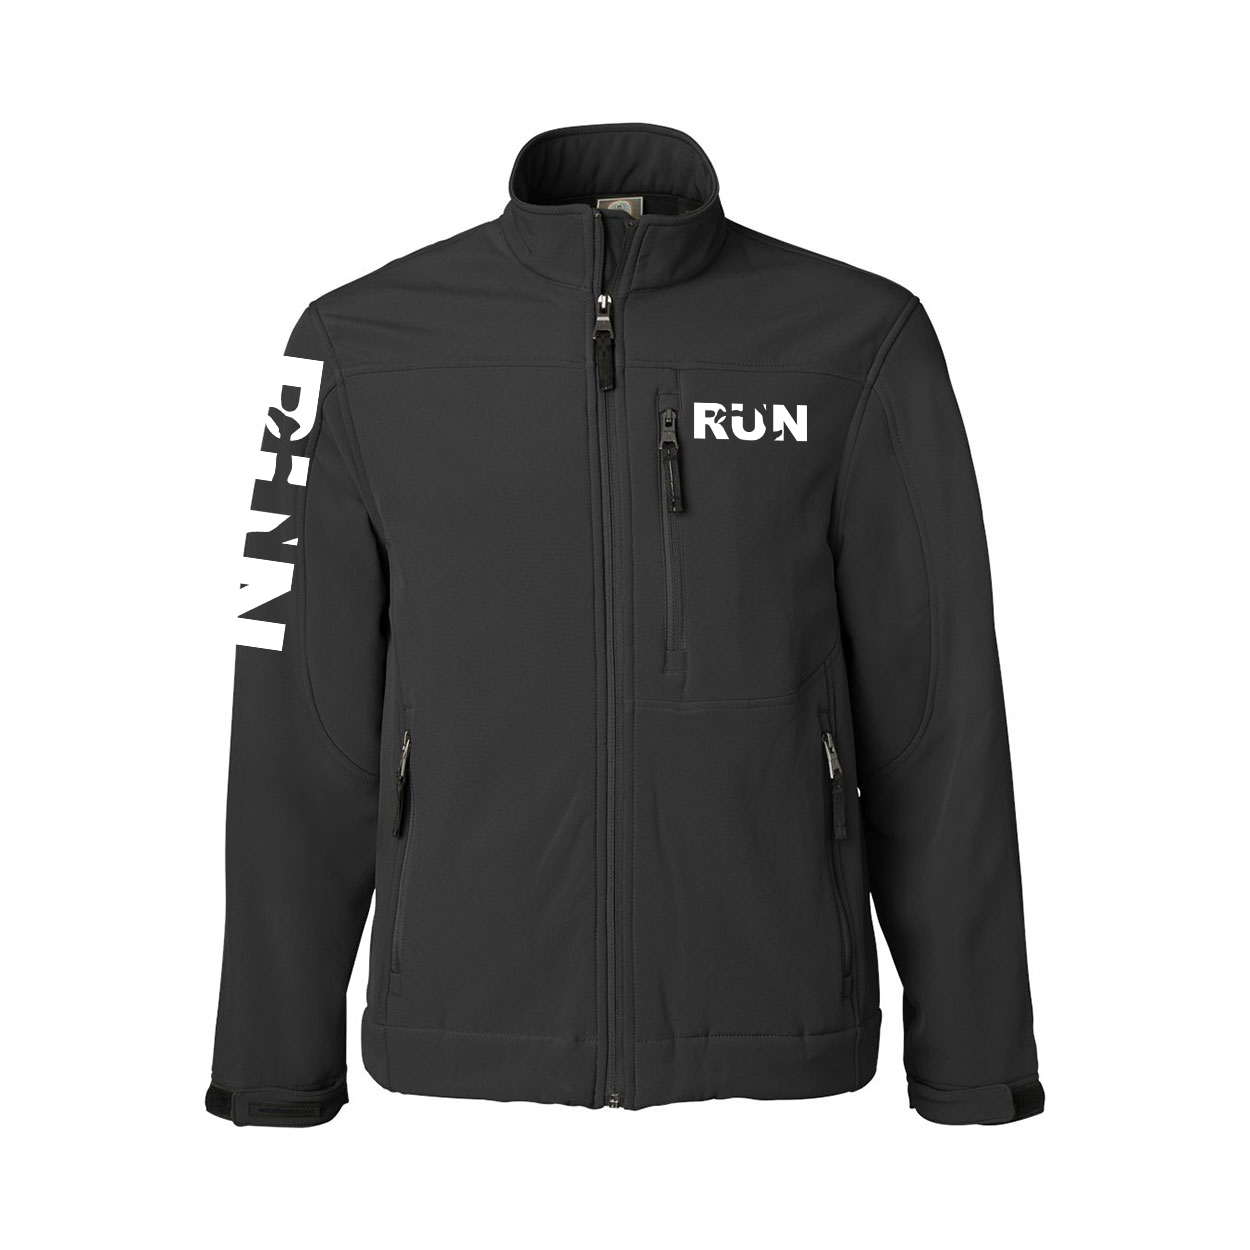 Run Jog Logo Classic Soft Shell Weatherproof Jacket (White Logo)